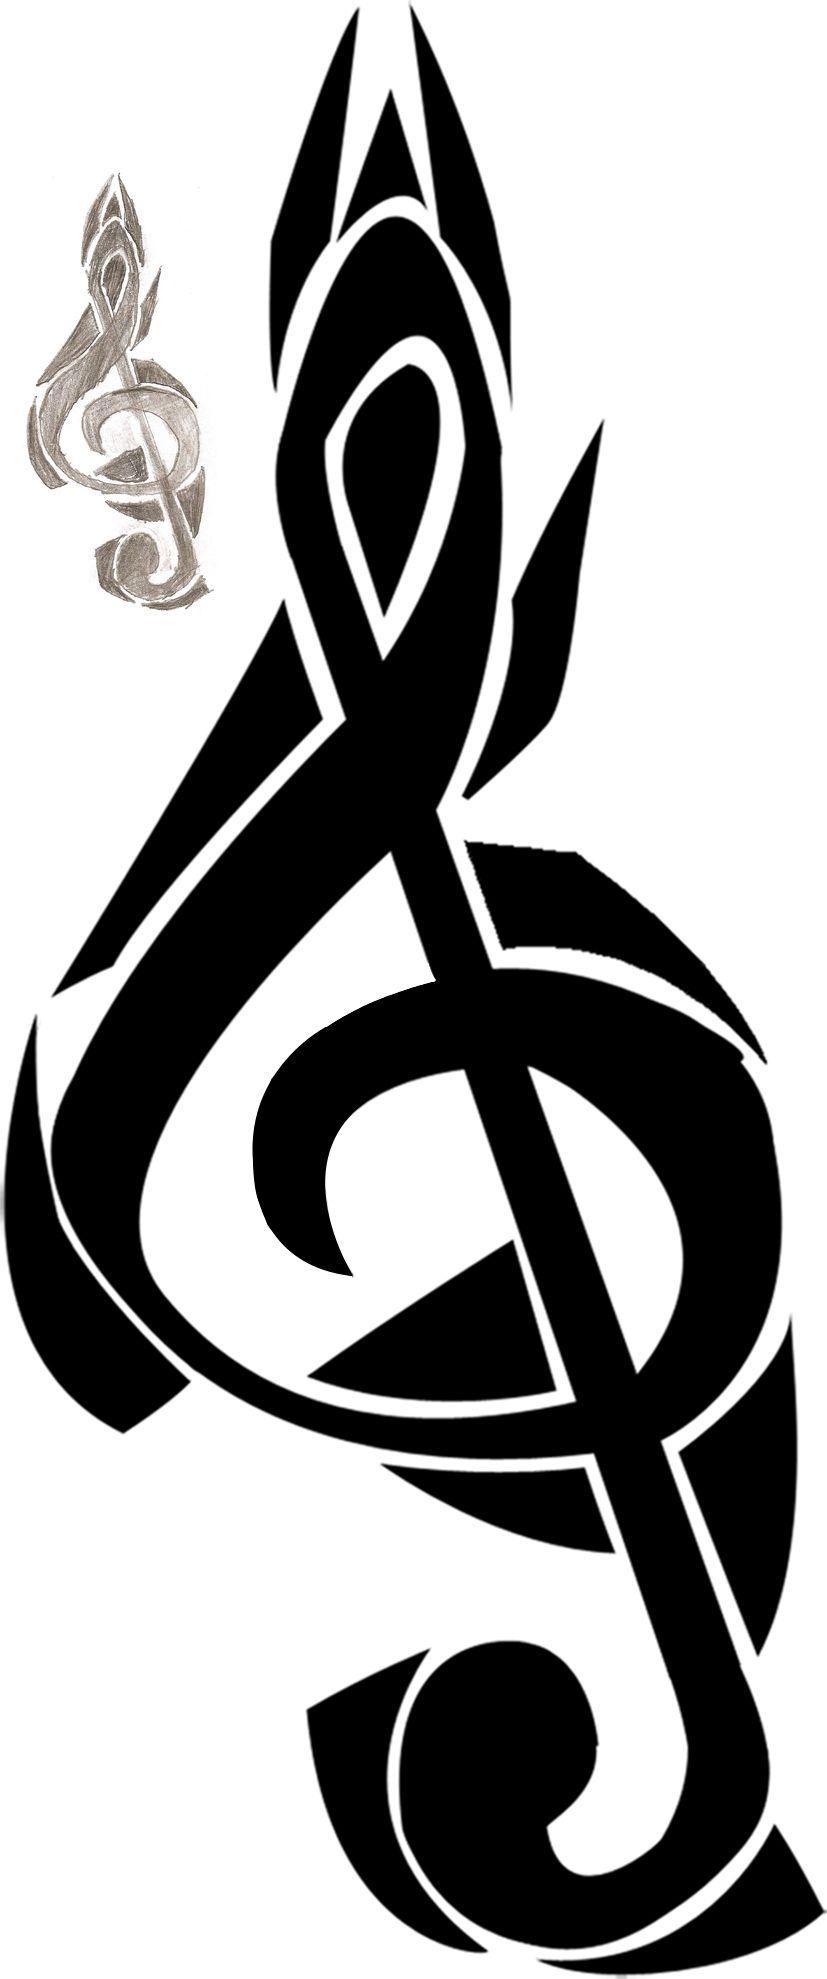 Tribal Treble Clef Tattoo Designs Treble clef tribal